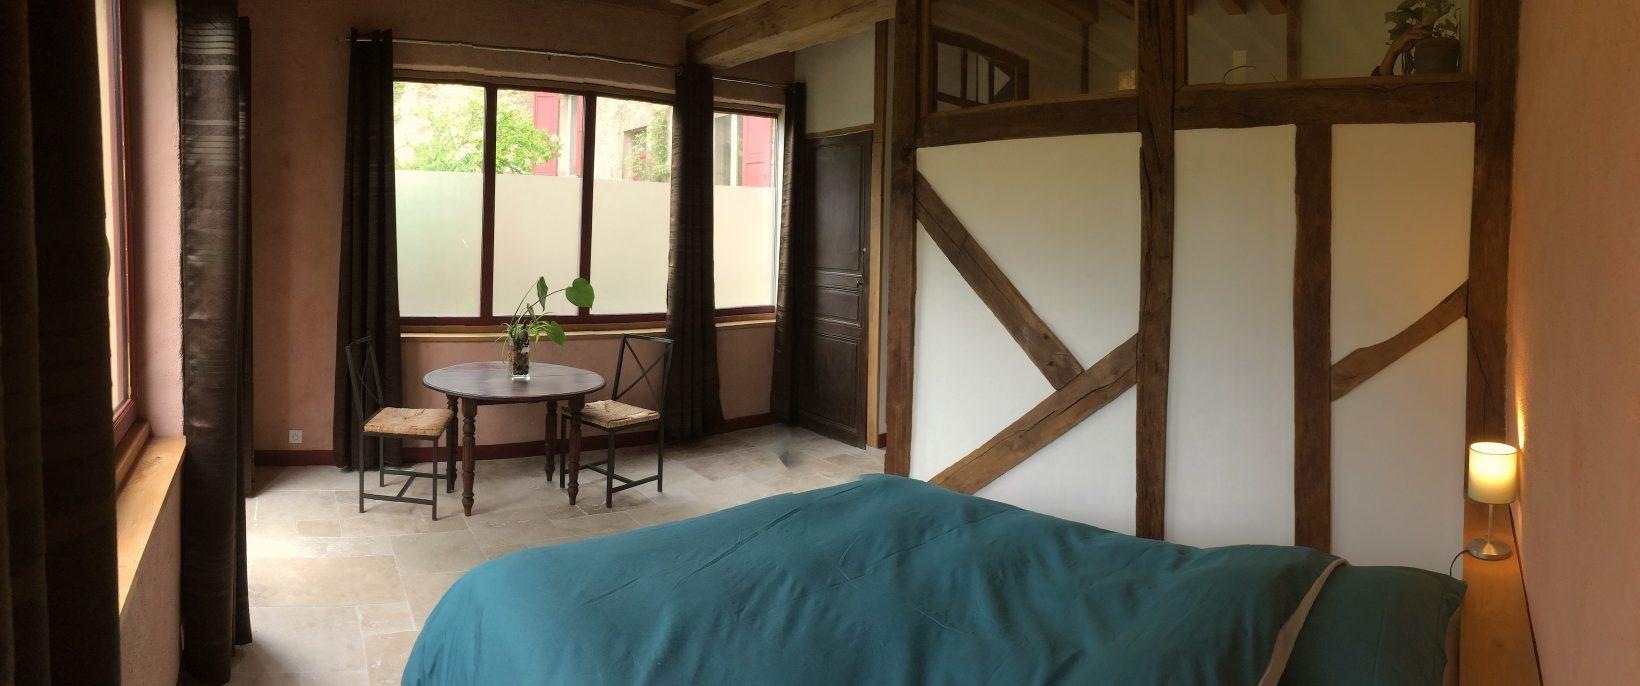 conditions de location a l 39 atelier. Black Bedroom Furniture Sets. Home Design Ideas